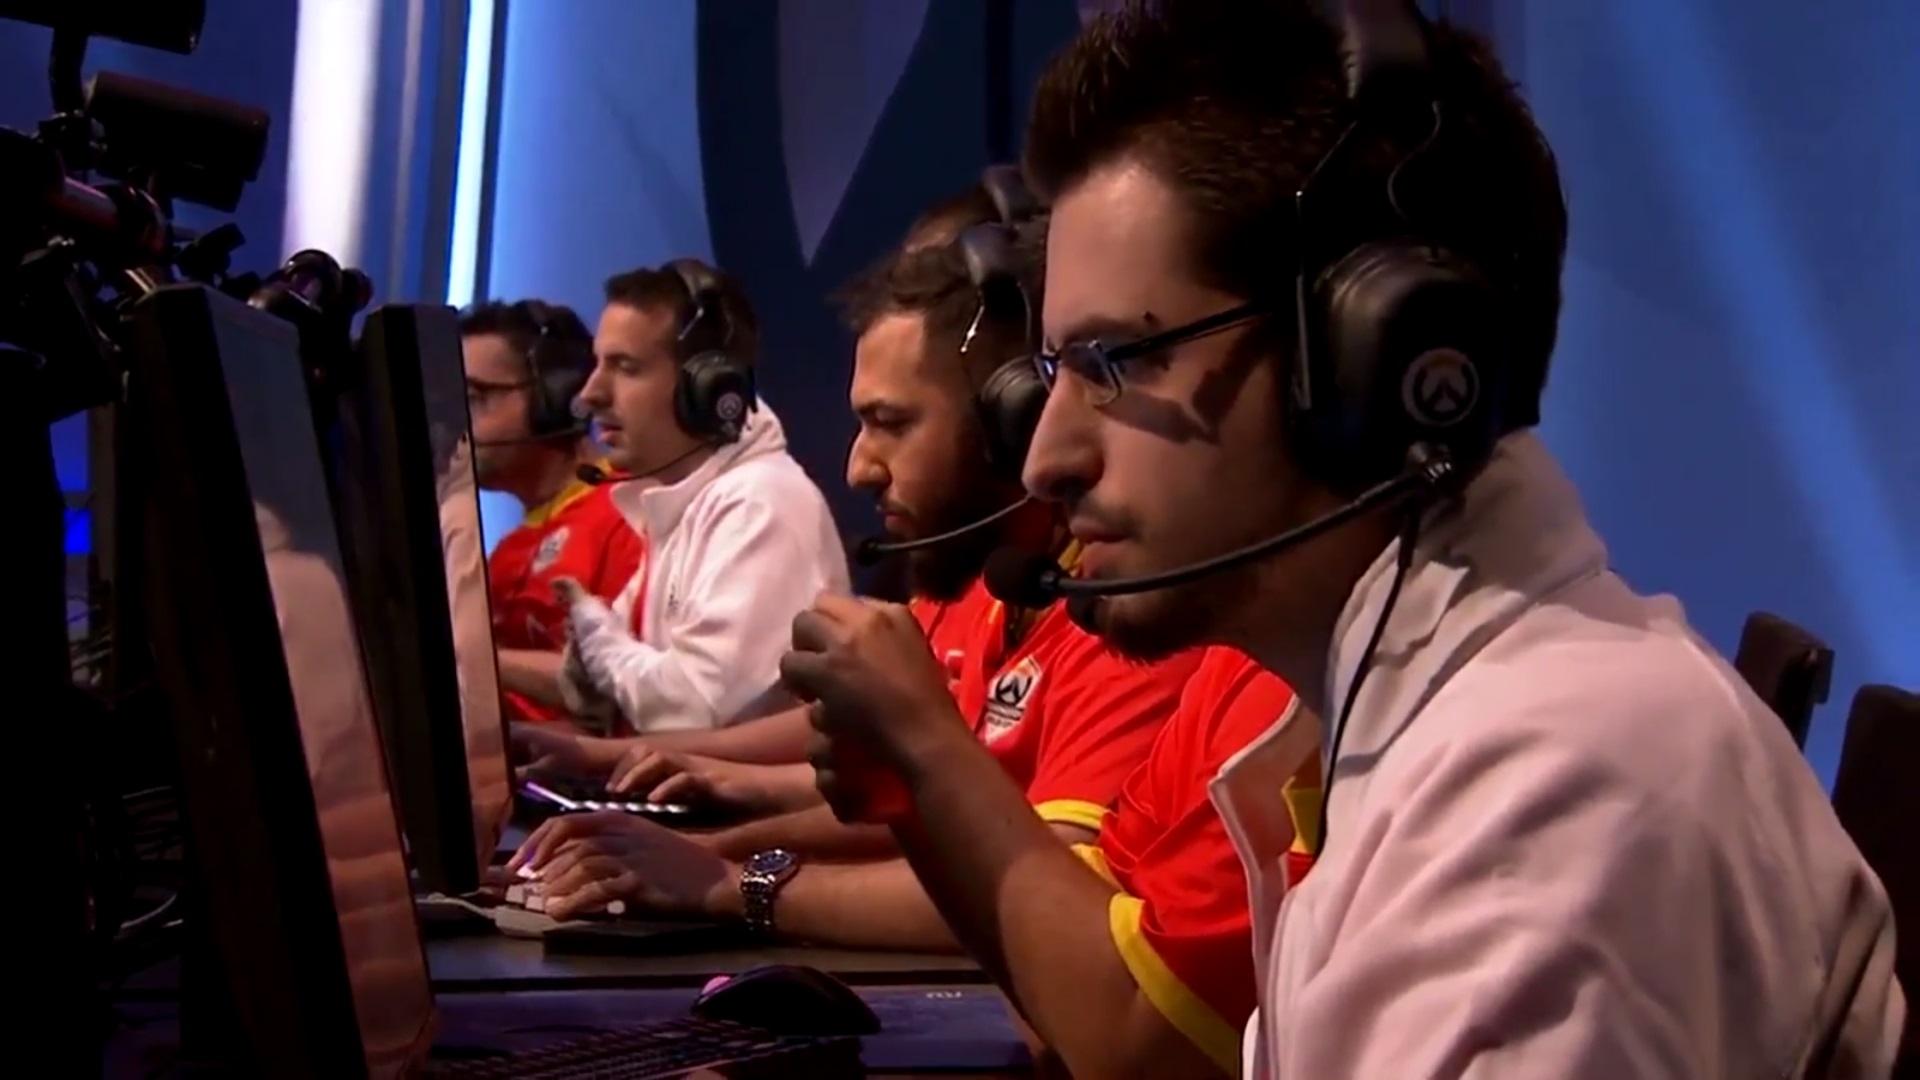 España Overwatch World Cup